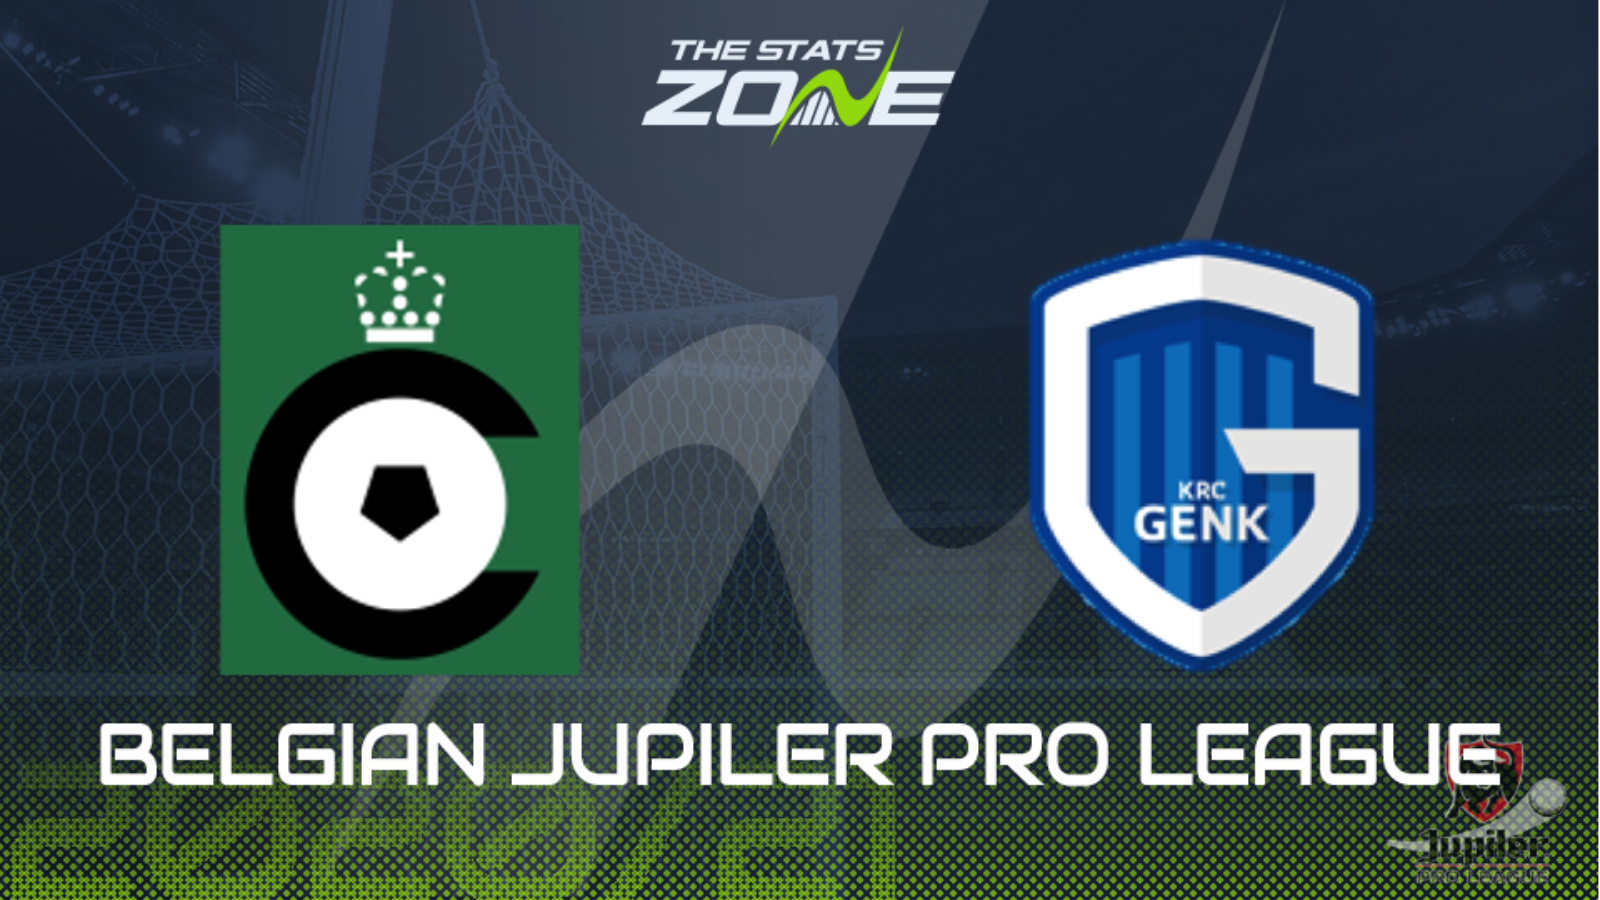 2020 21 Belgian Jupiler Pro League Cercle Brugge Vs Genk Preview Prediction The Stats Zone